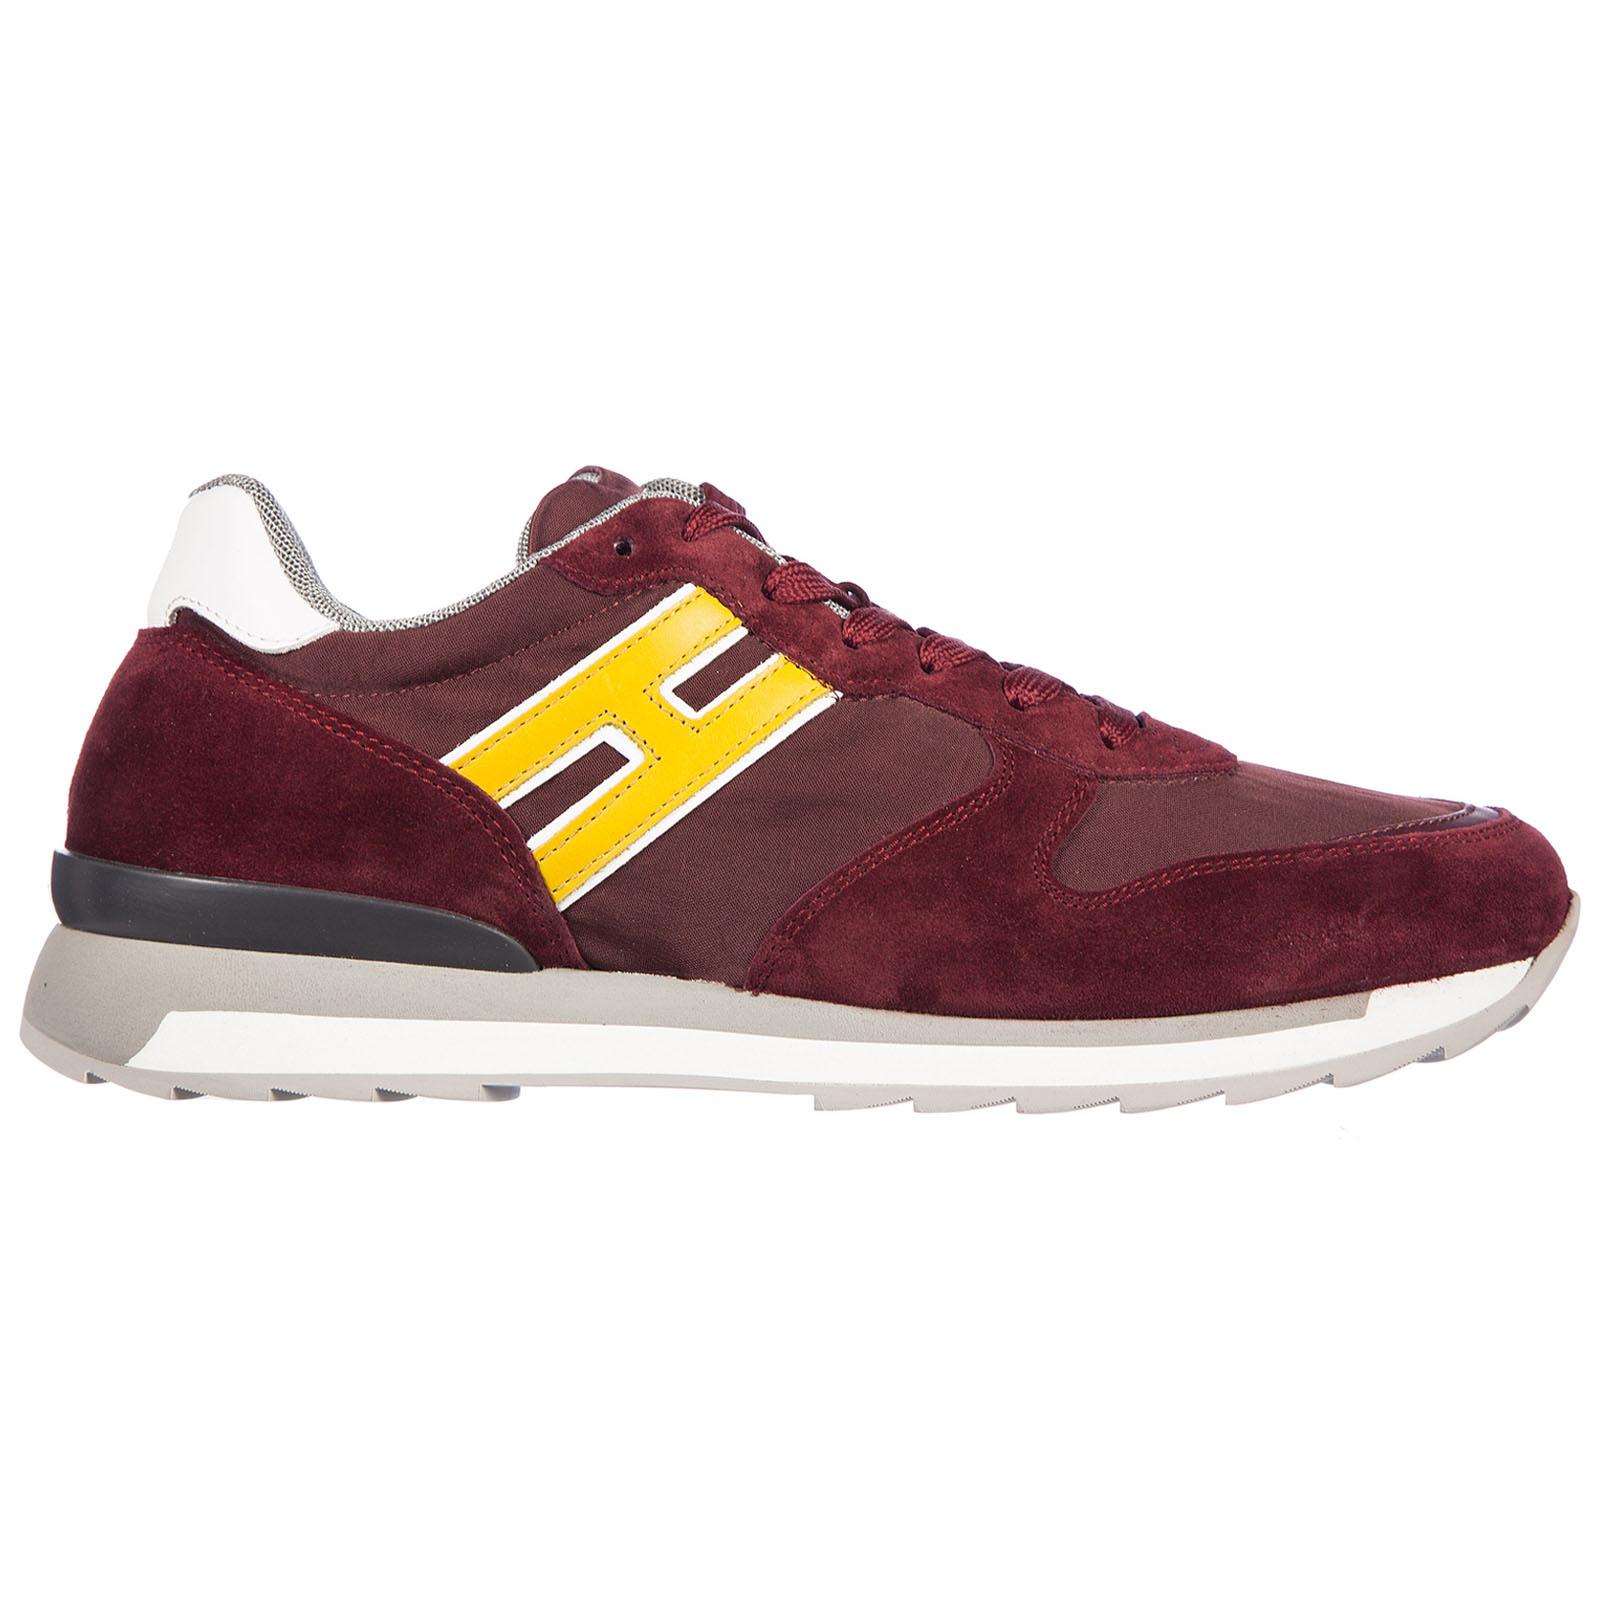 Sneakers Hogan Rebel HXM2610R6718IT0AZY bordeaux  2597edc8048